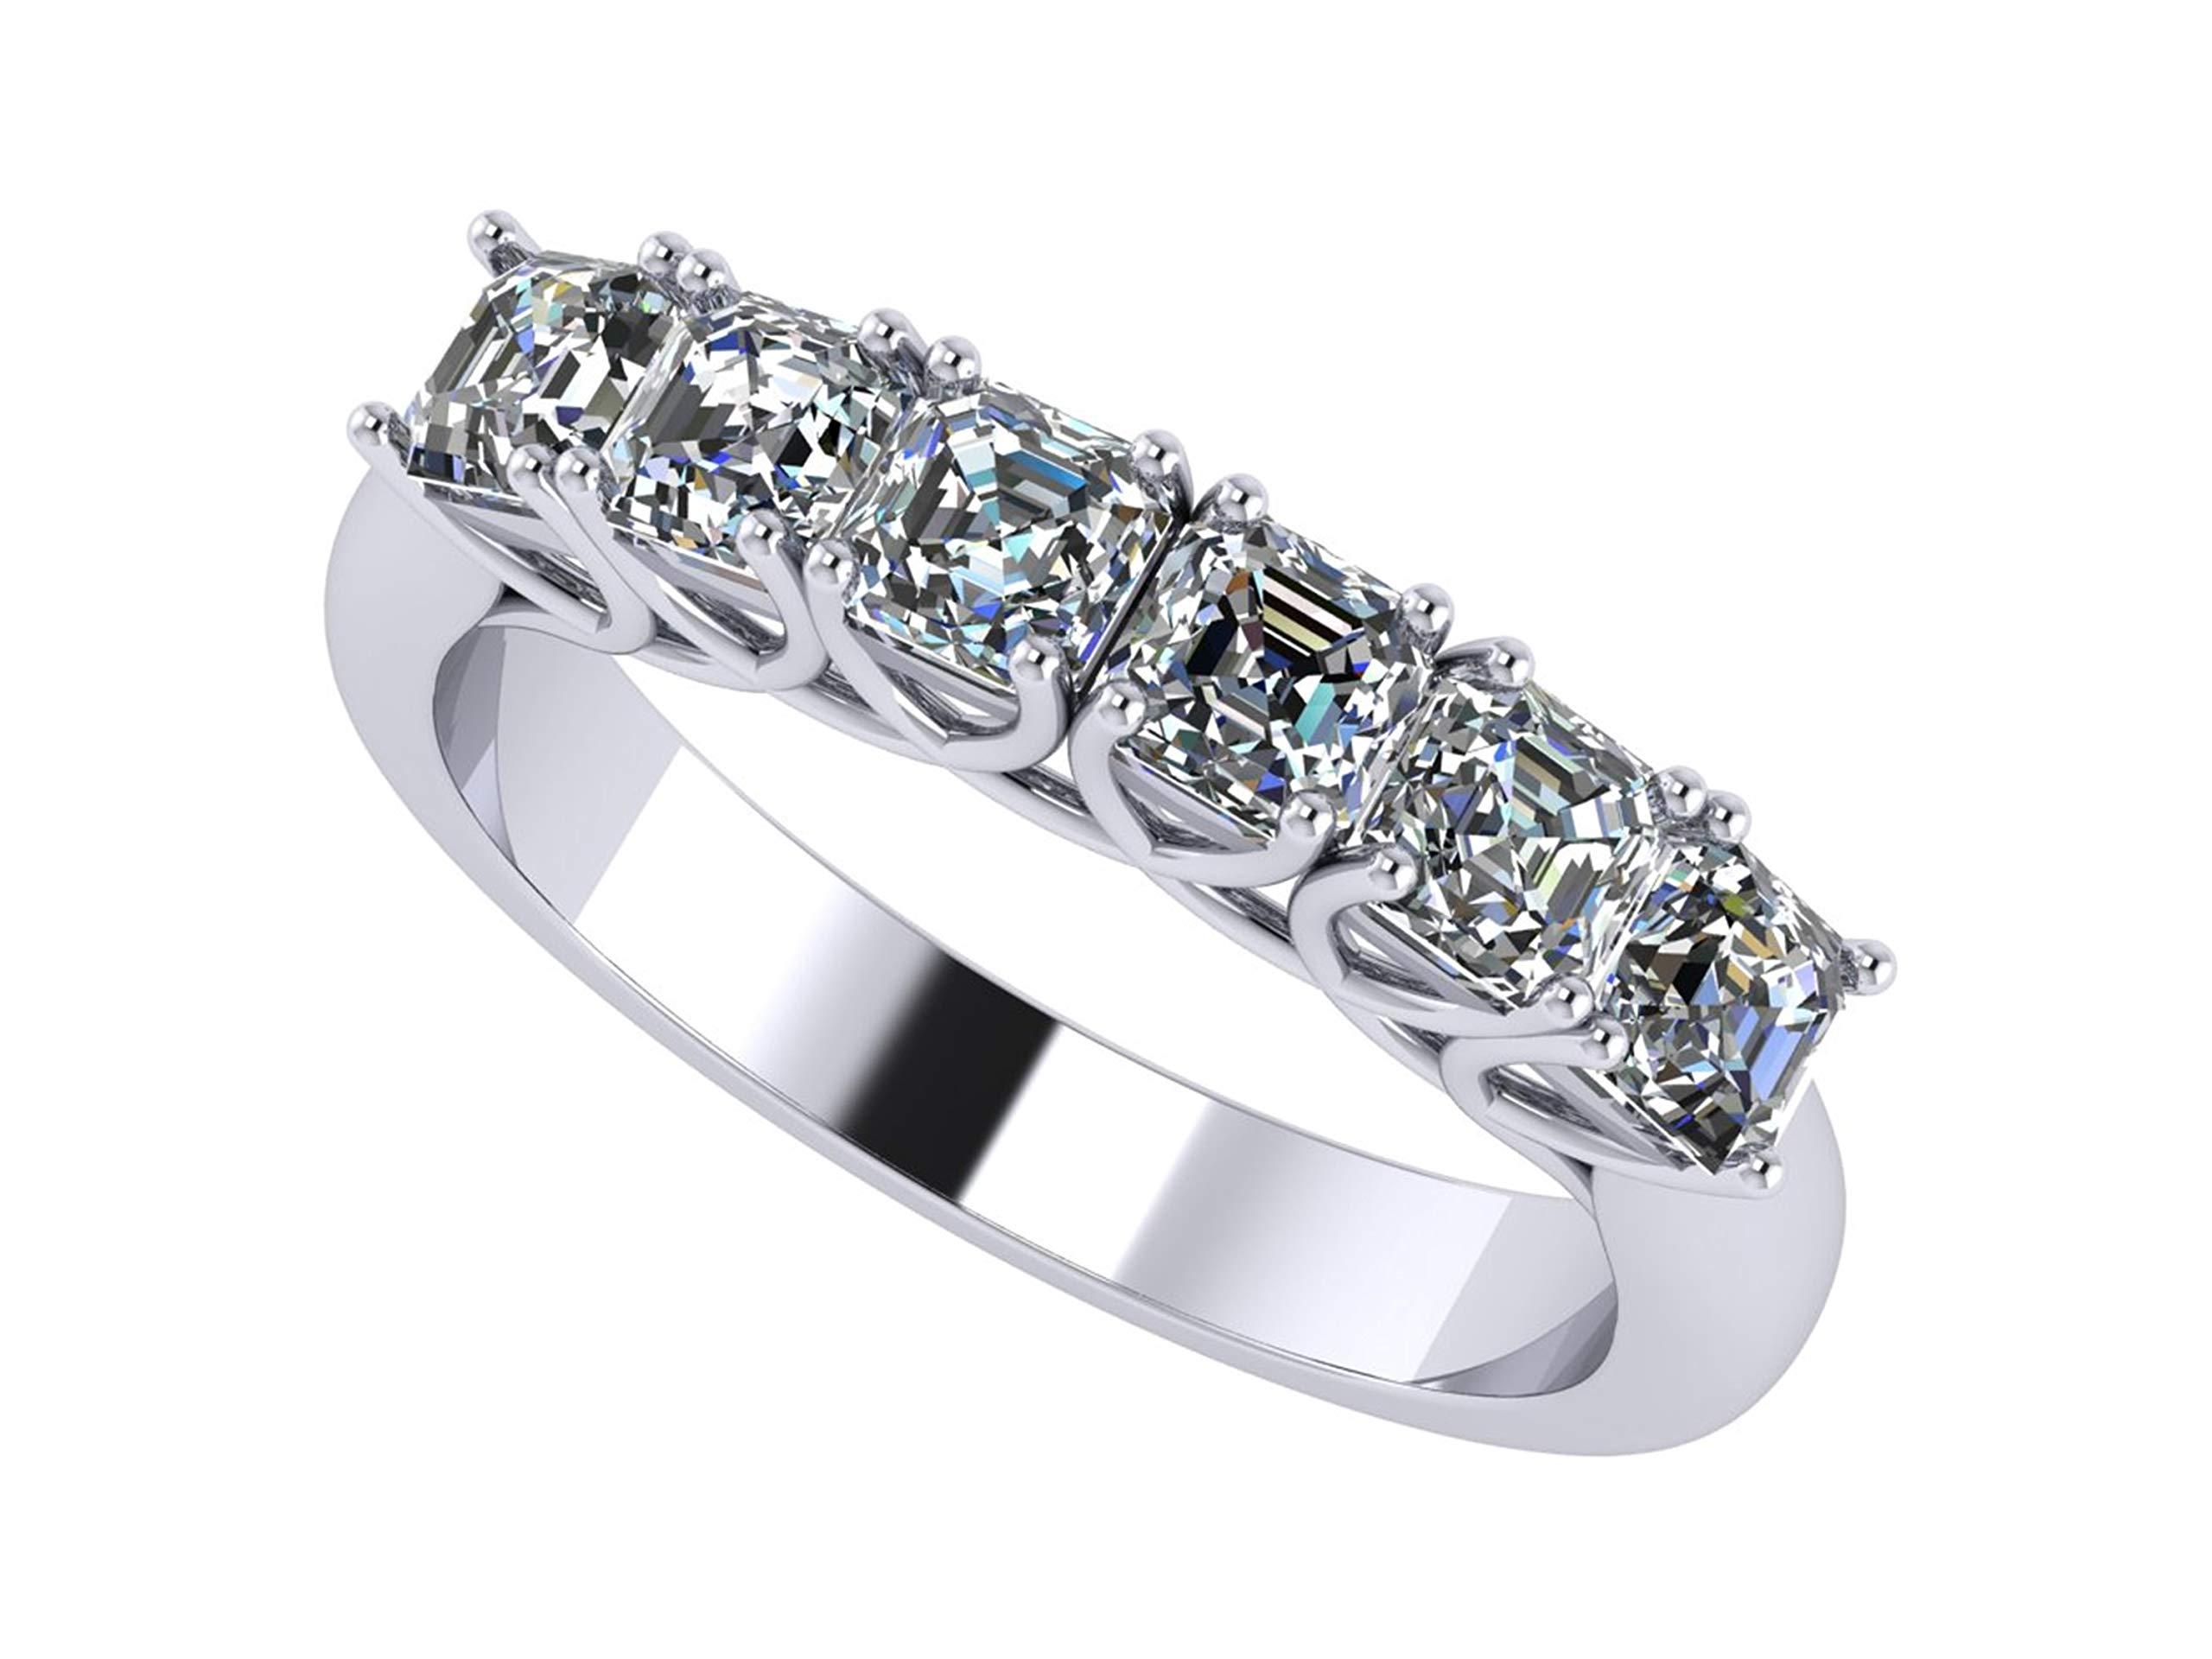 NANA Asscher Cut 1ctw Simulated Diamond Anniversary Ring, Swarovski ZirconiaCZ Wedding Engagement Band-Silver-Size 5.5